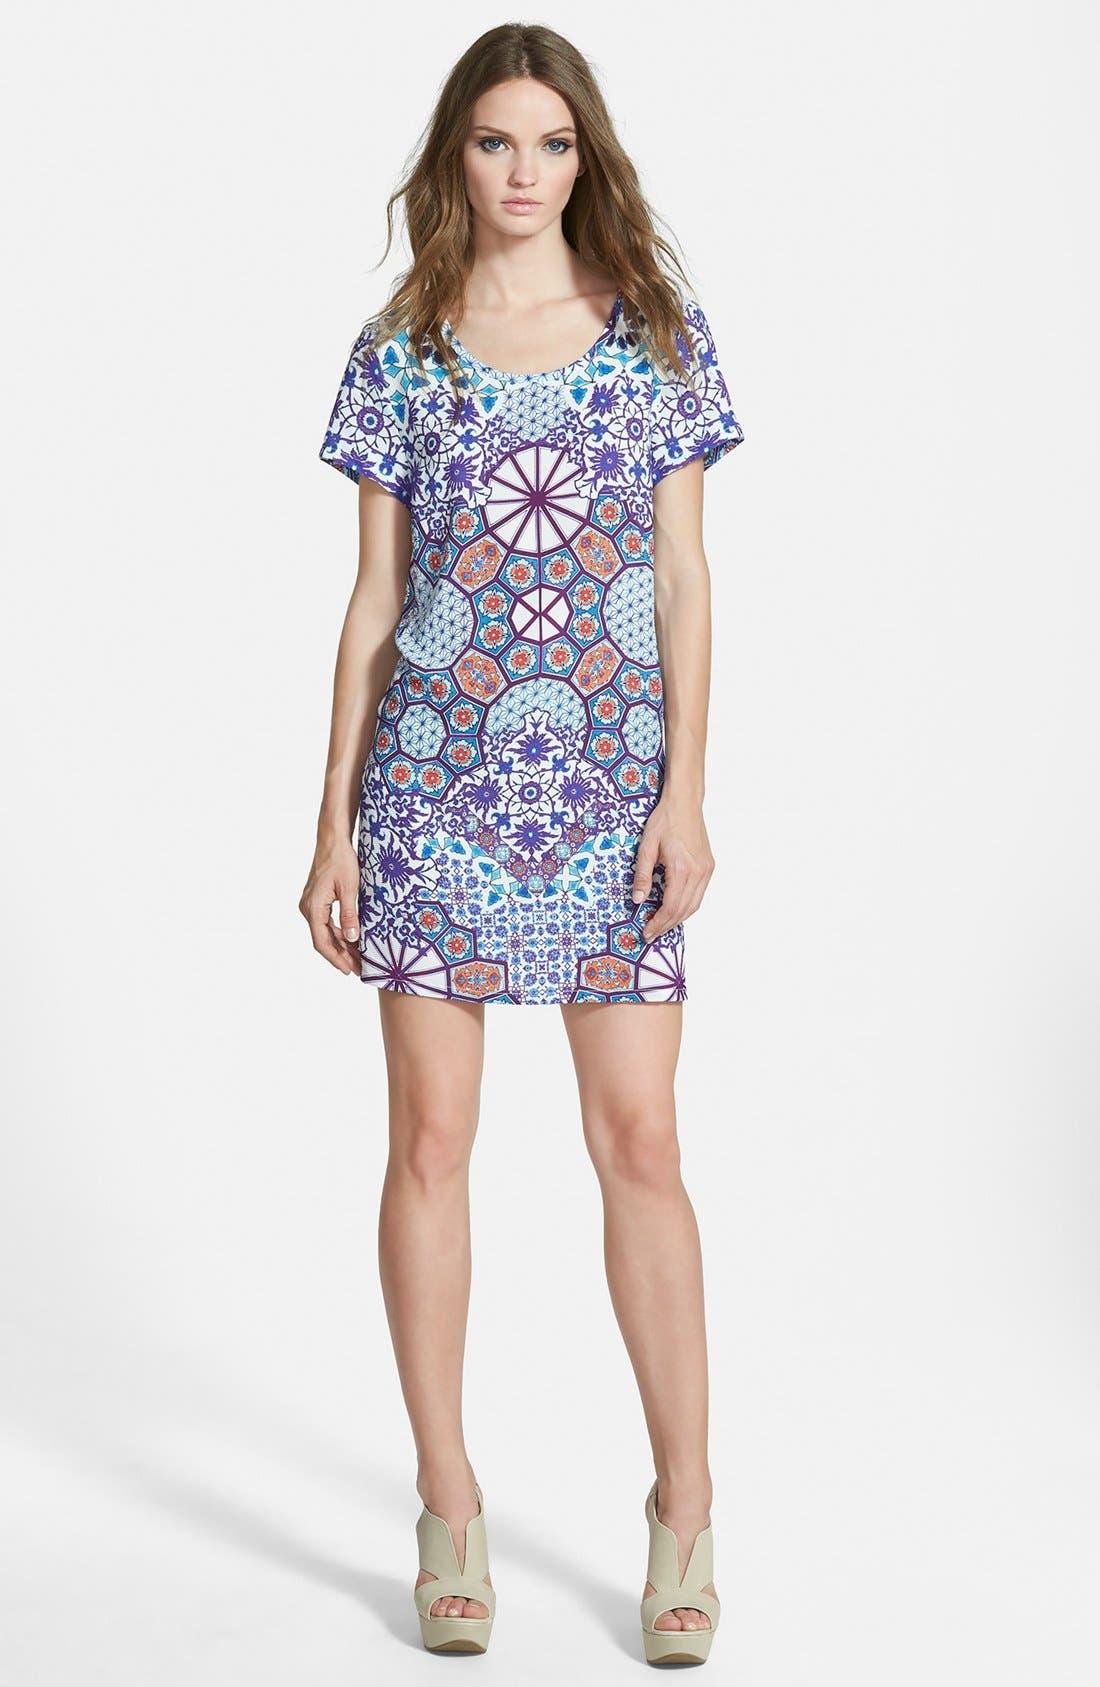 Main Image - MINKPINK 'Whisper of the Heart' T-Shirt Dress